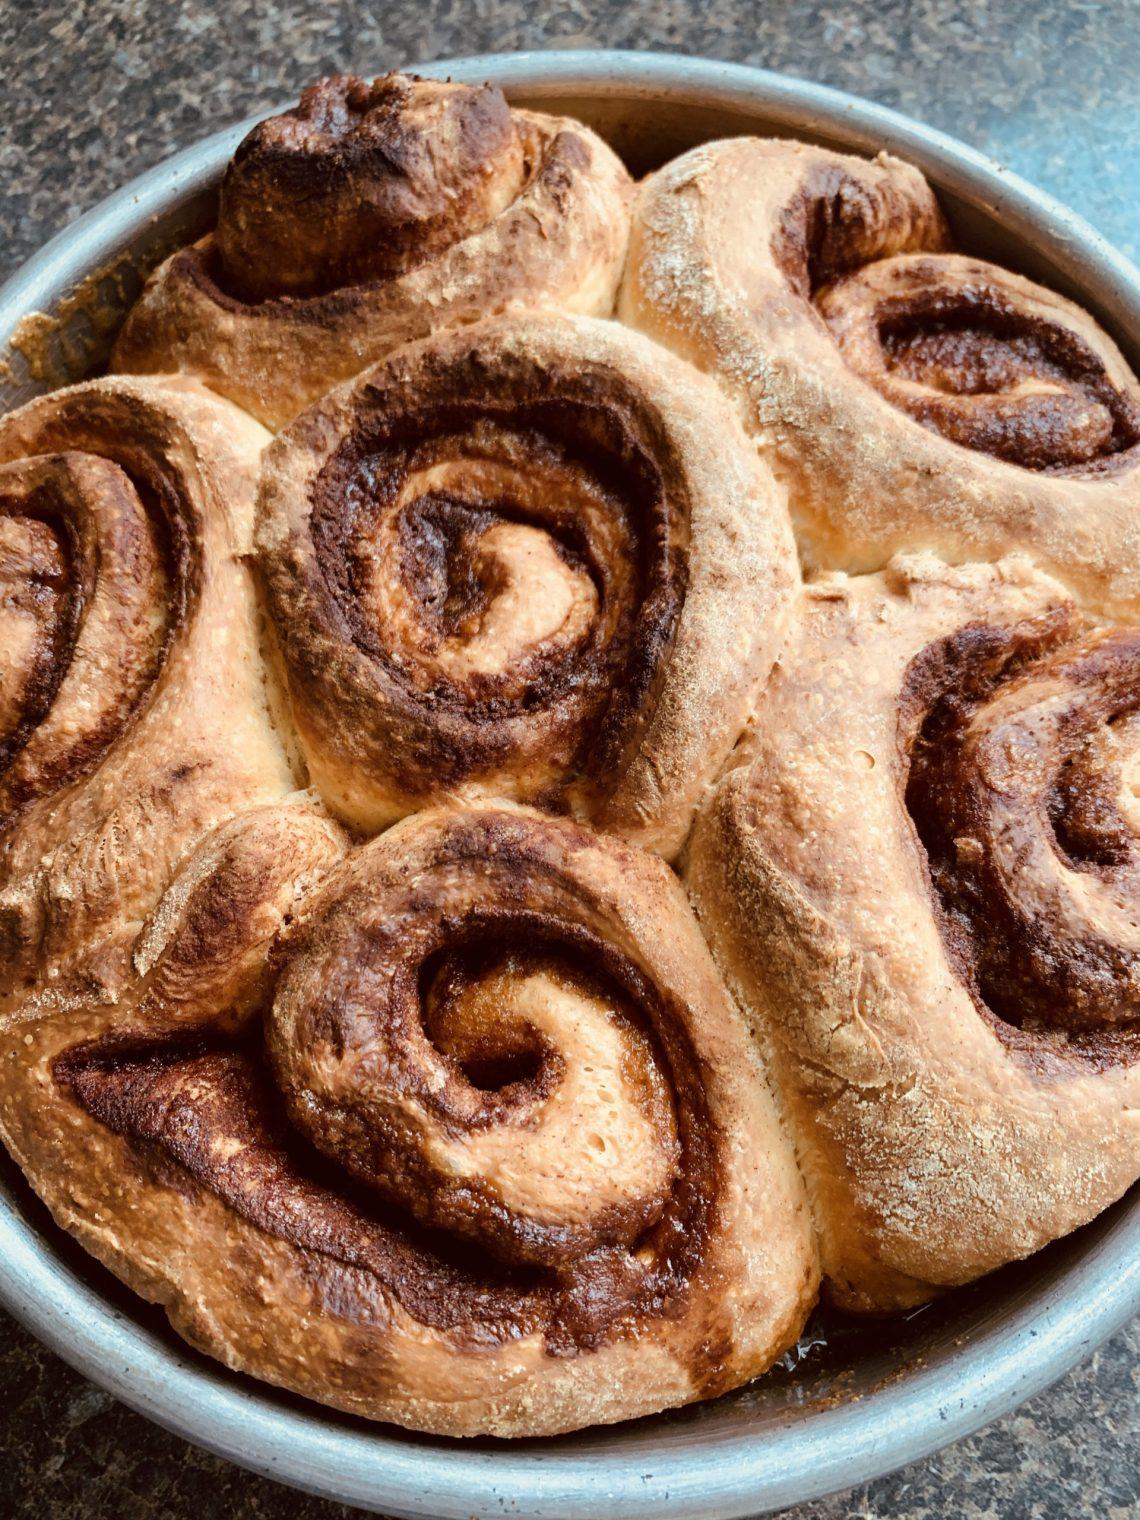 Cinnamon Rolls with Food Processor Bread Dough